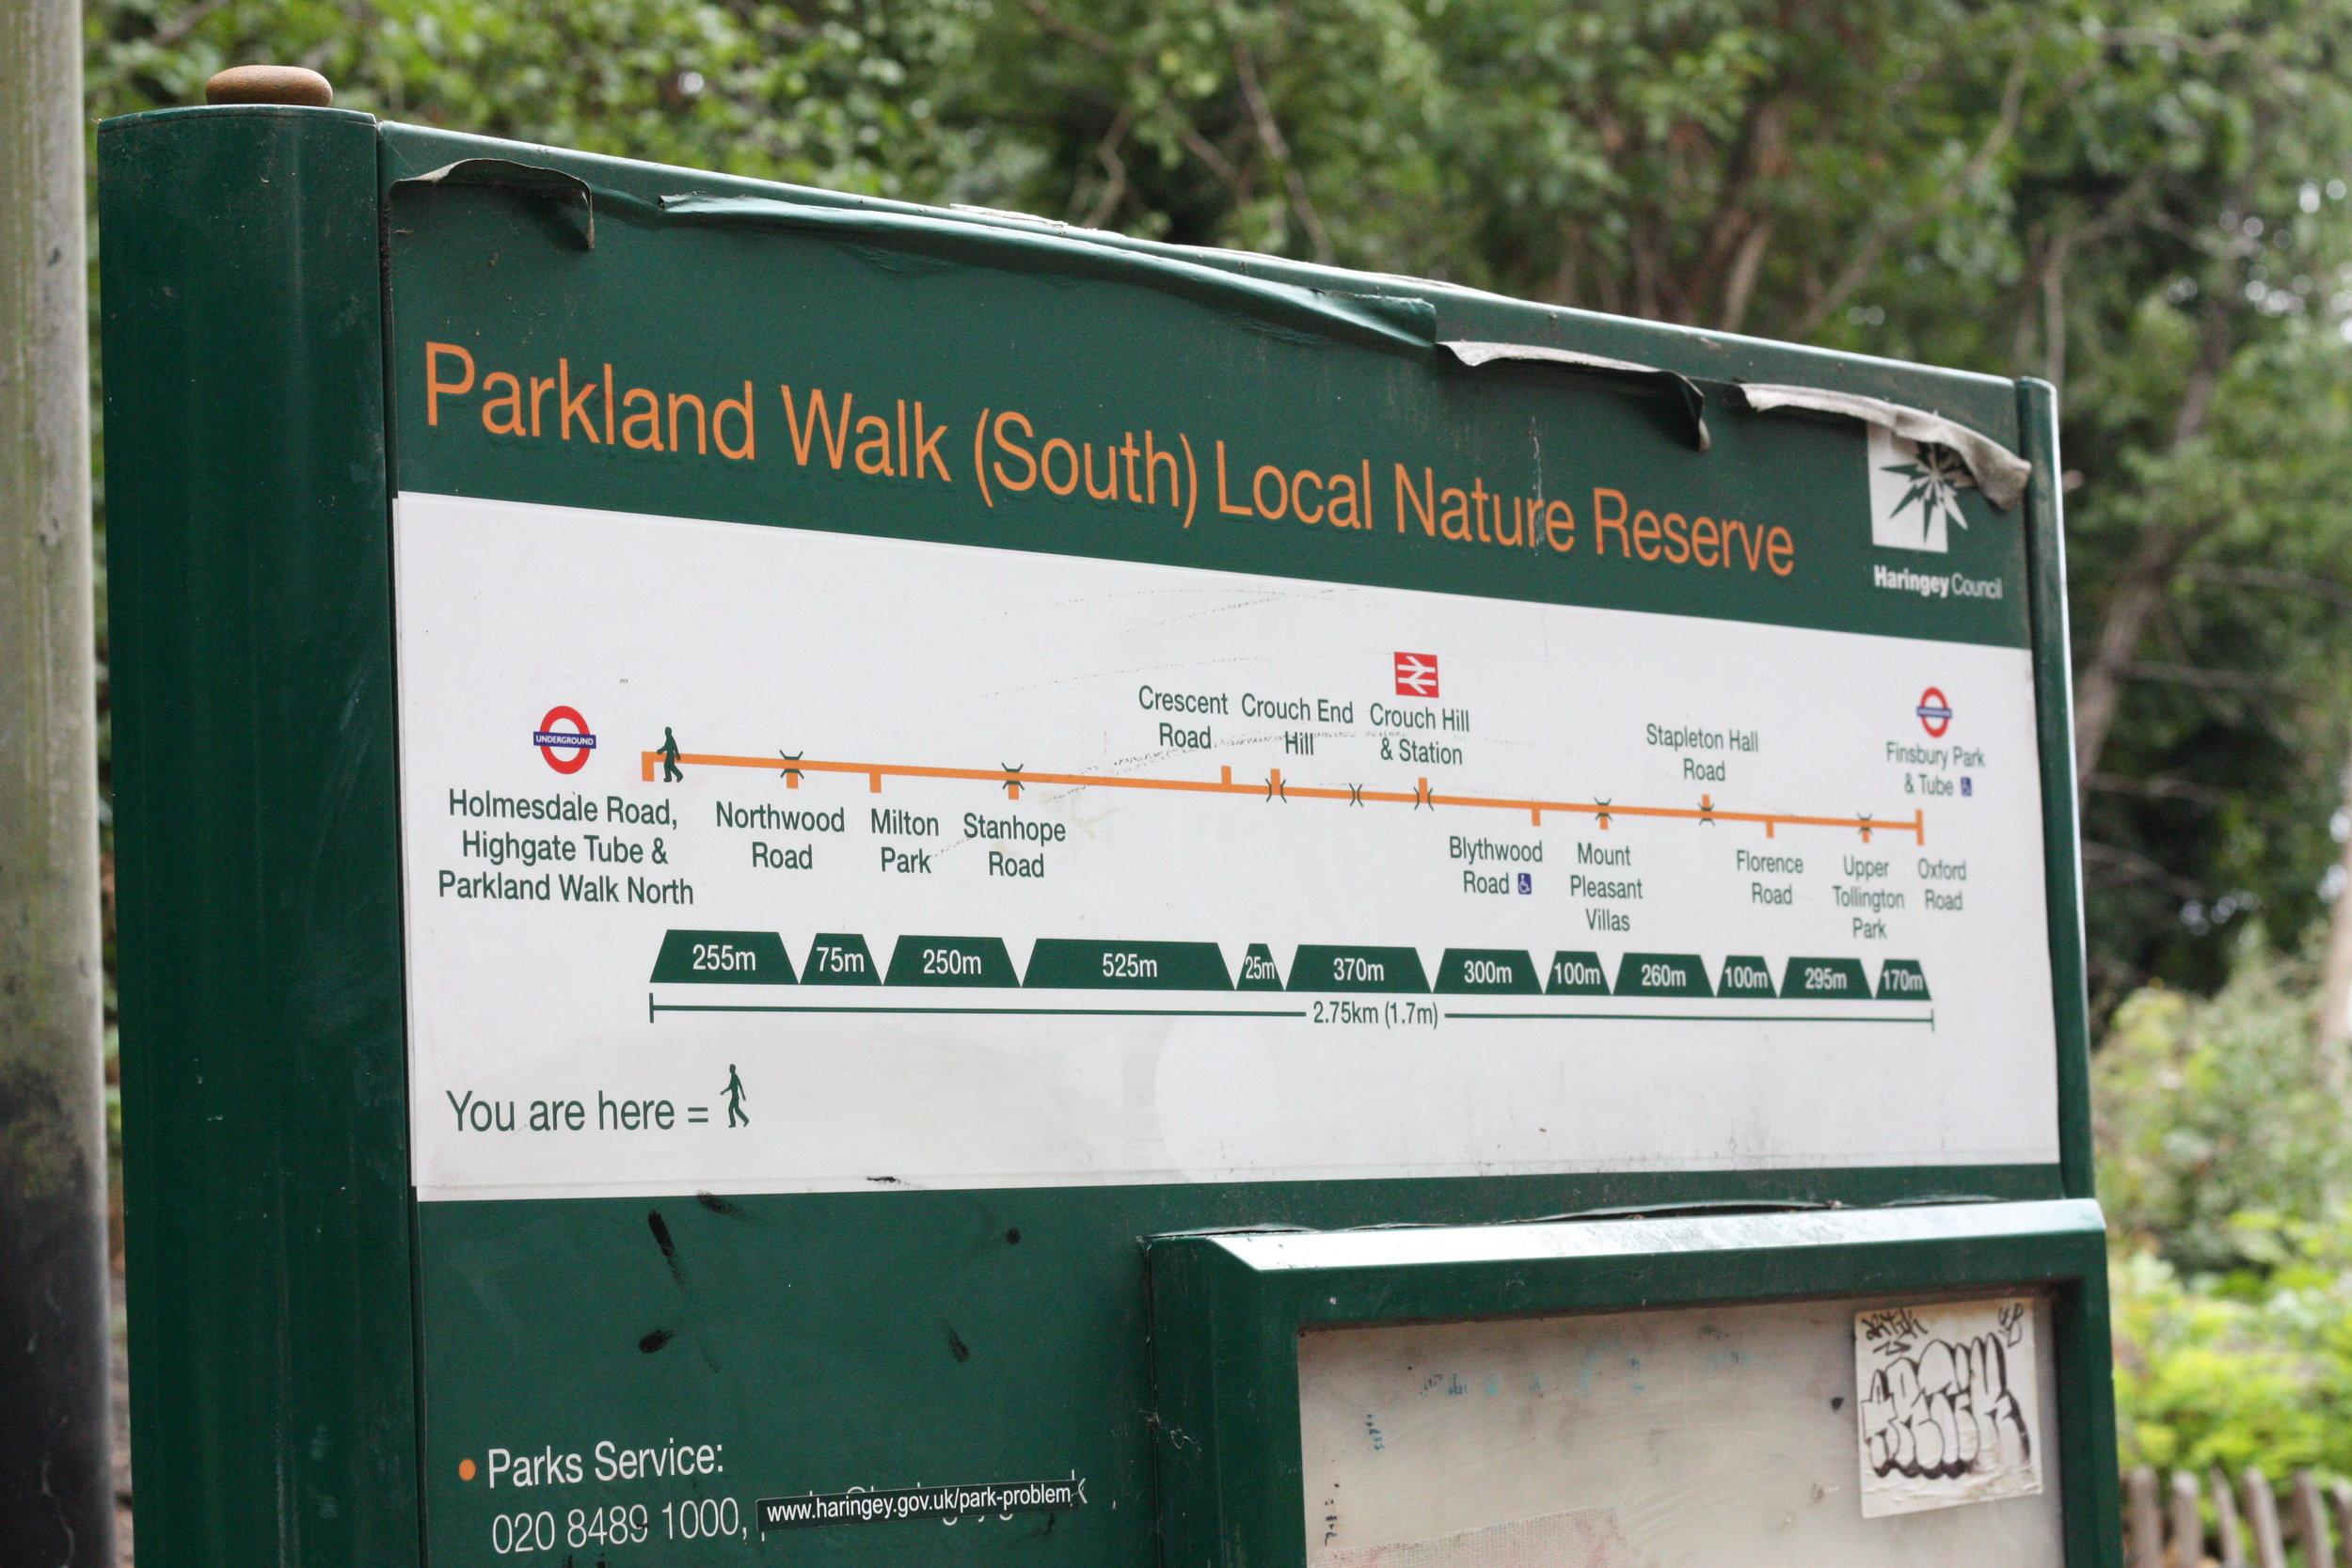 parkland-walk-sign